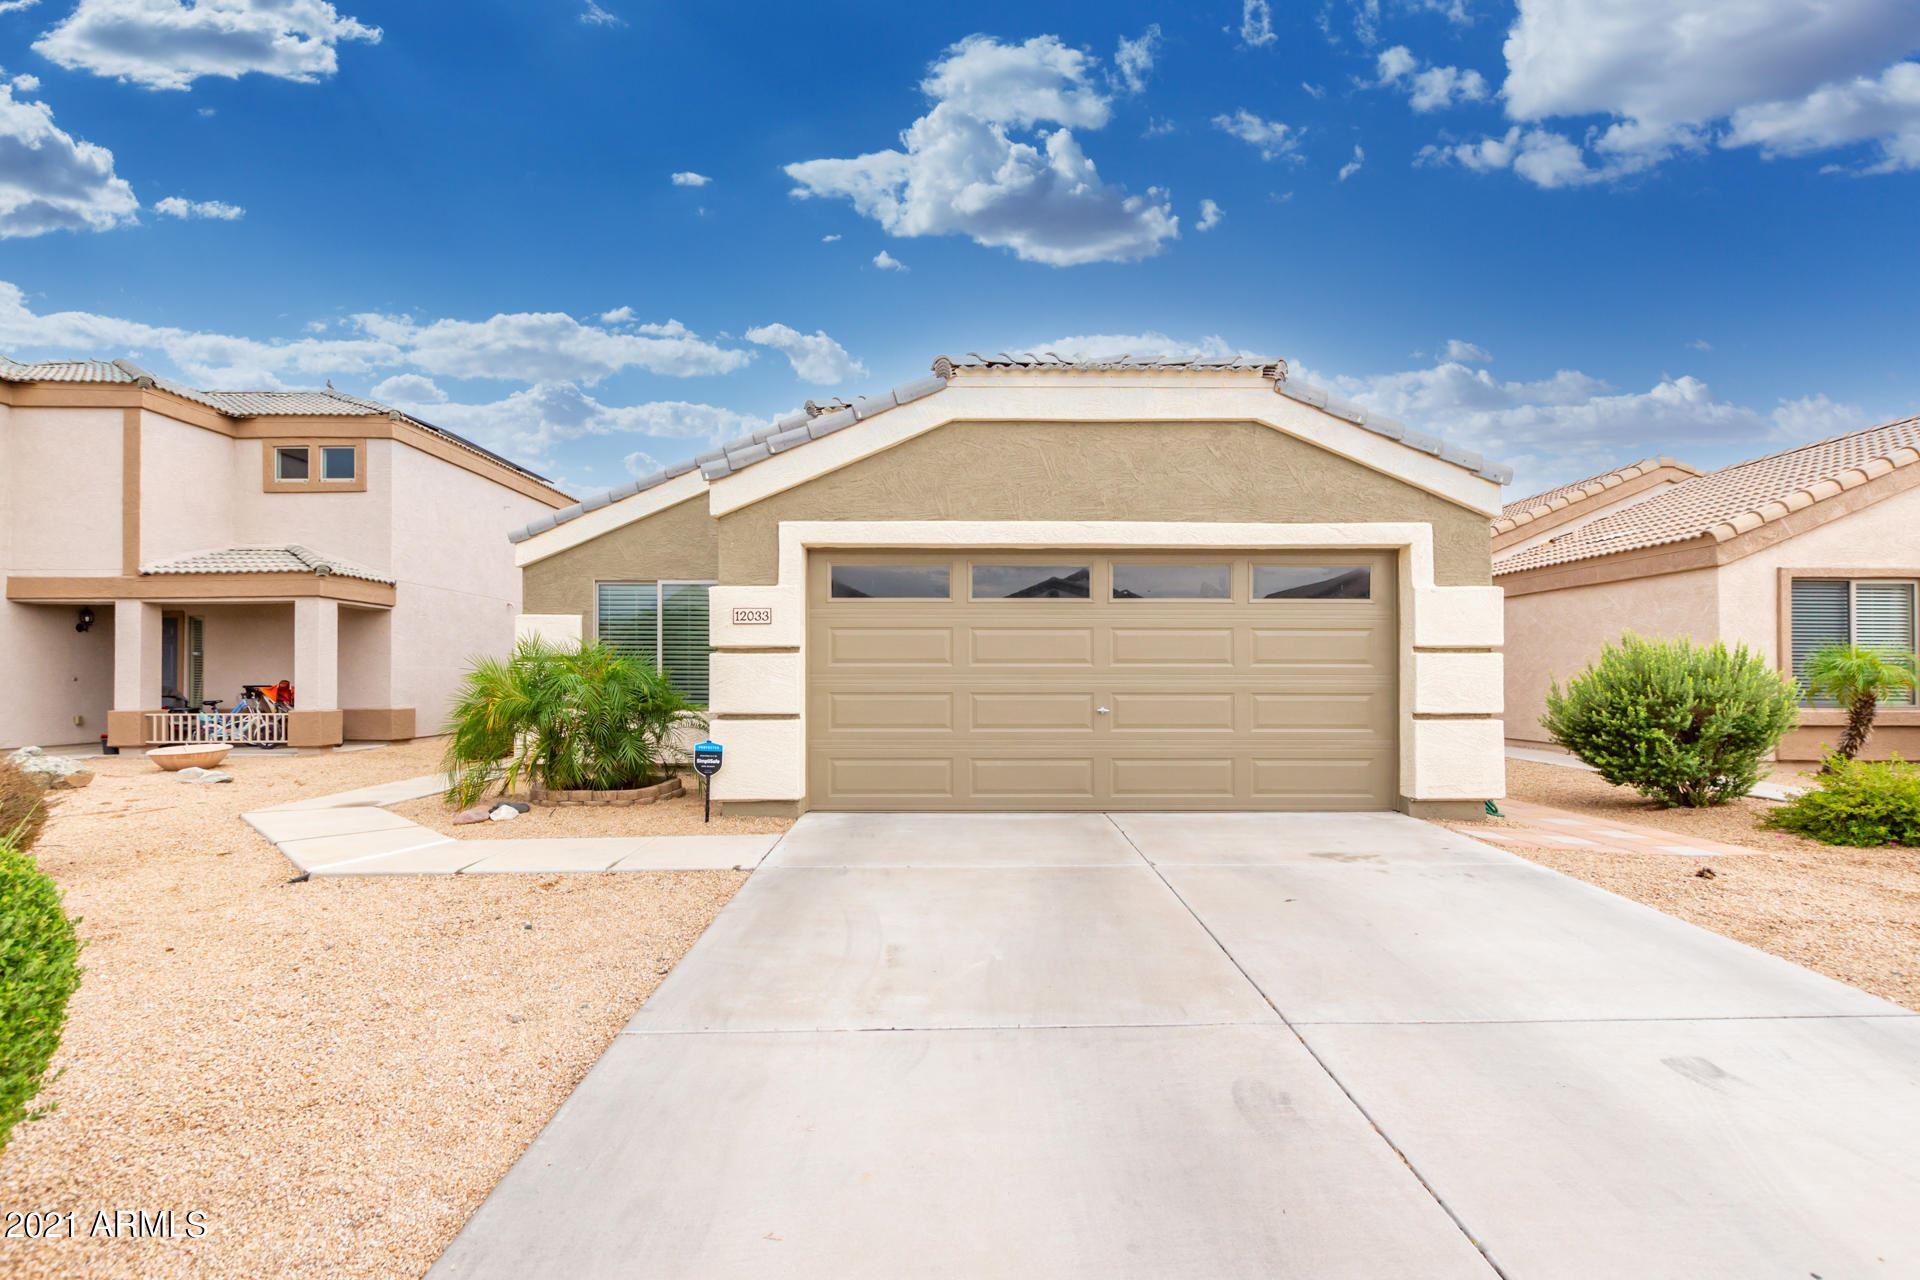 Photo of 12033 W CARIBBEAN Lane, El Mirage, AZ 85335 (MLS # 6268427)